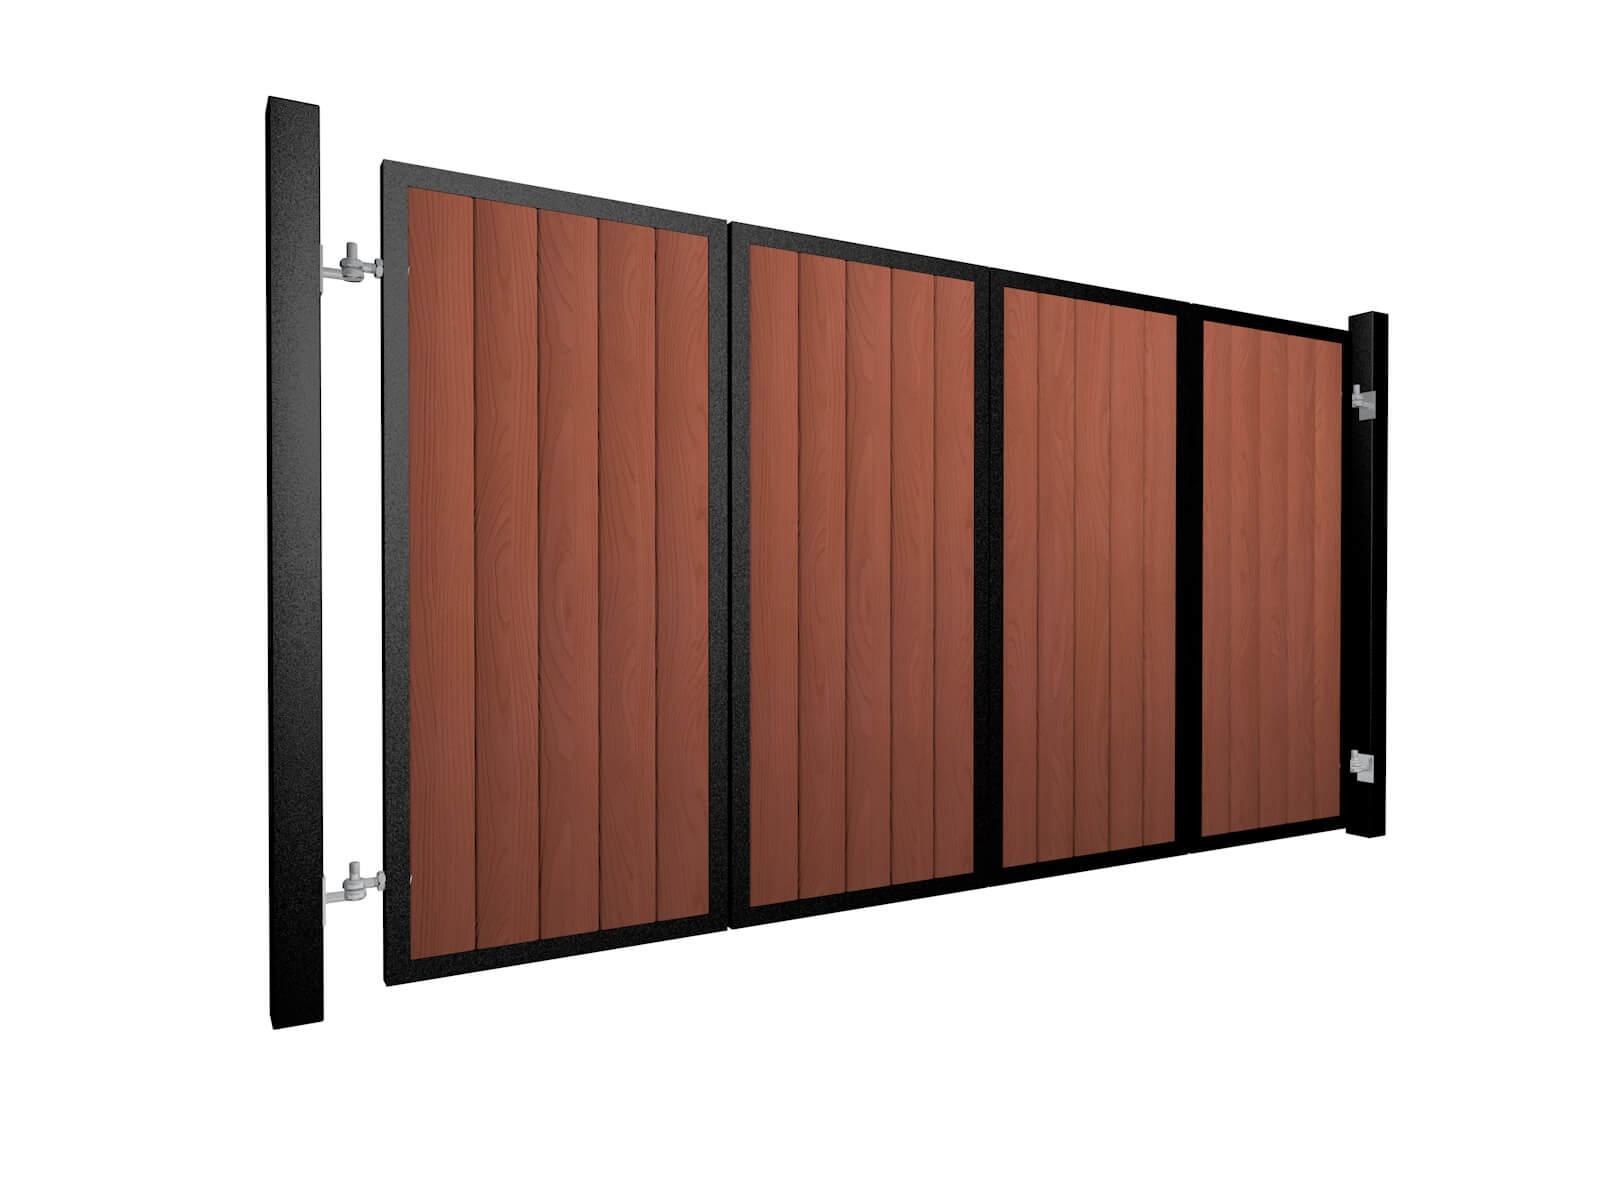 powder coated bi-fold vertical metal frame wood fill automated gates UK